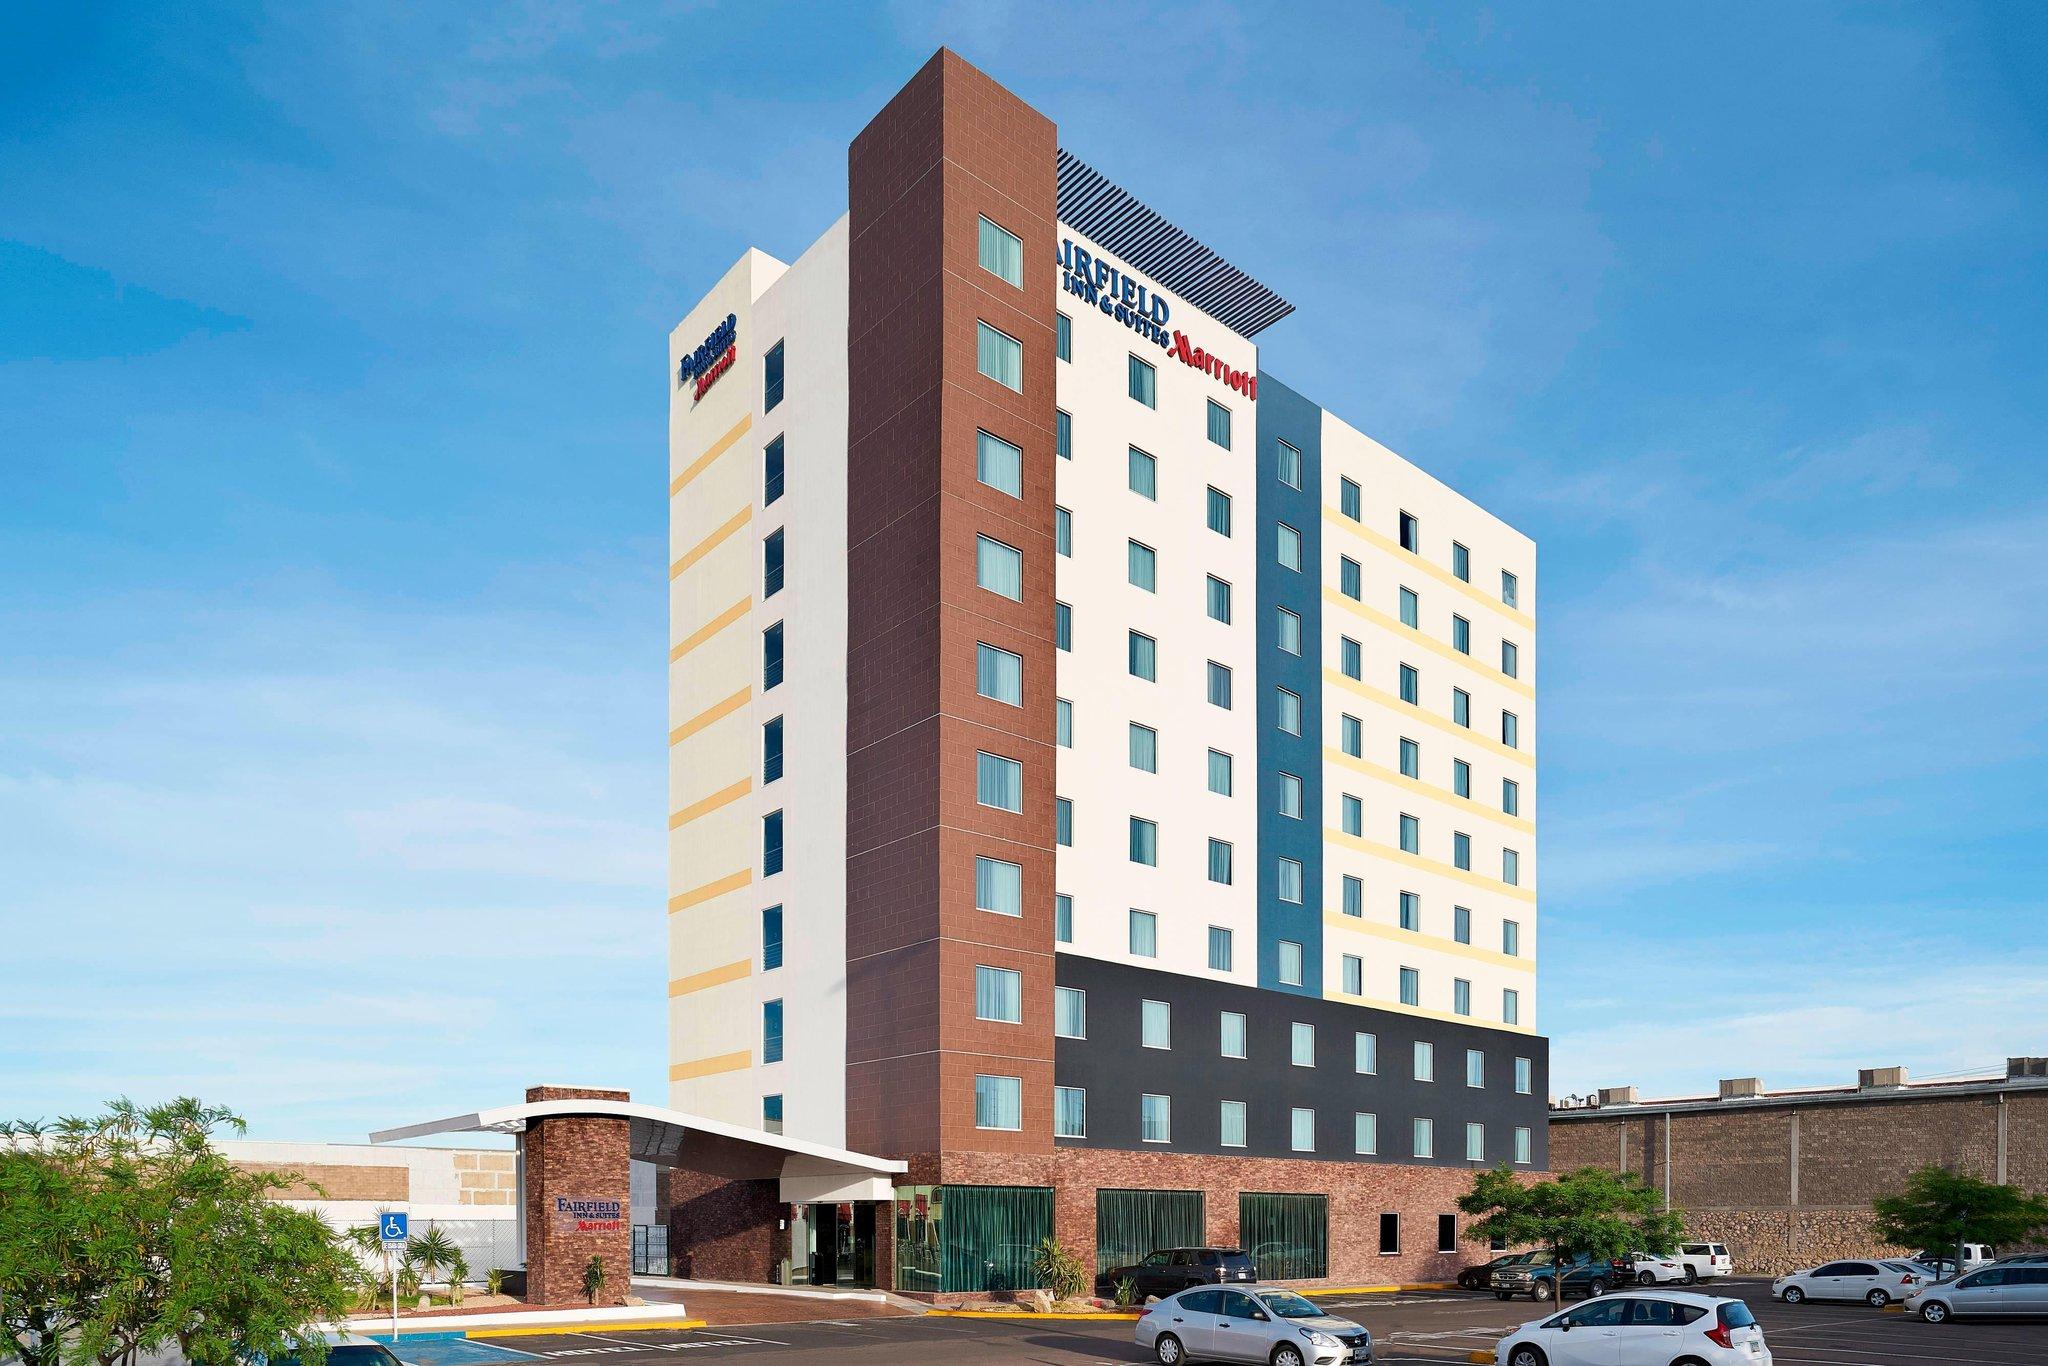 Fairfield Inn & Suites Nogales